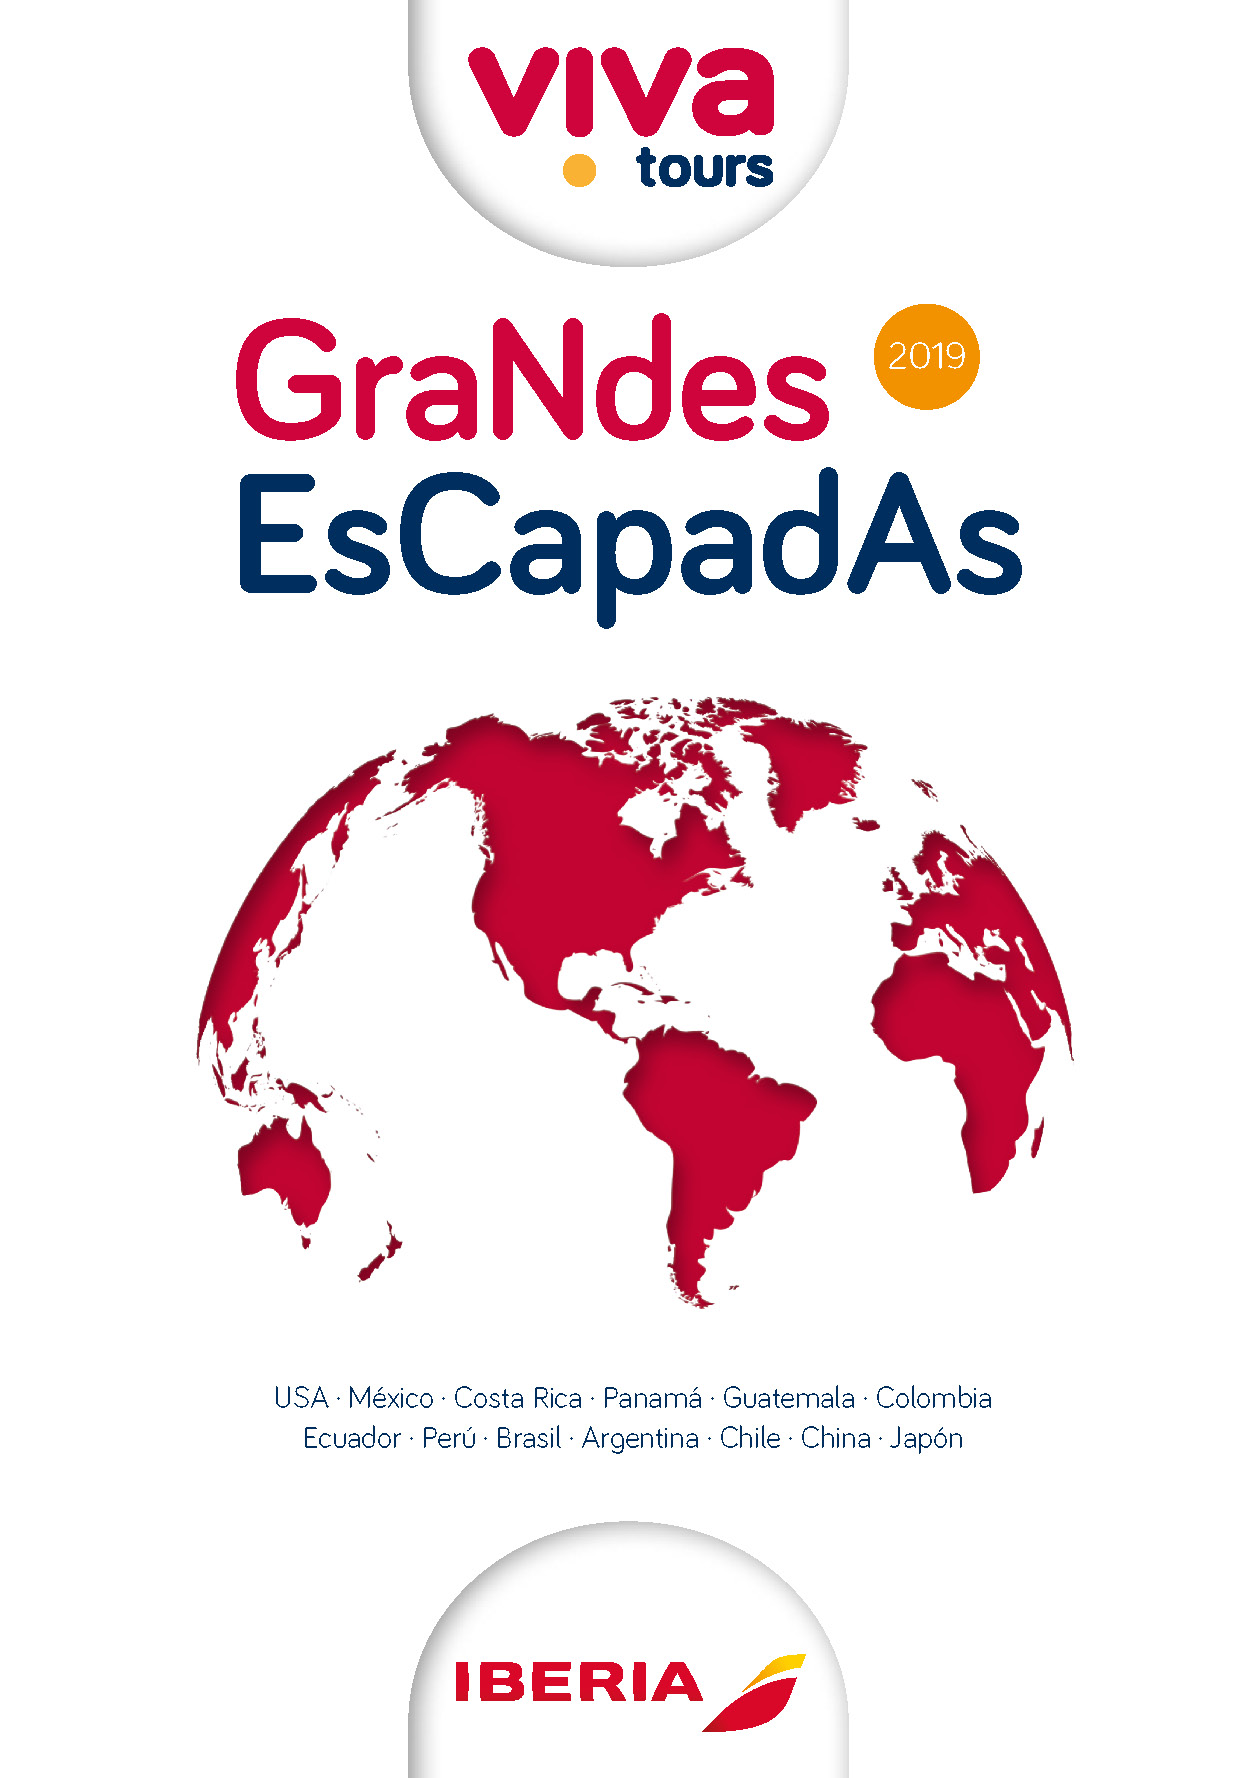 Catalogo Viva Tours Grandes Escapadas 2019